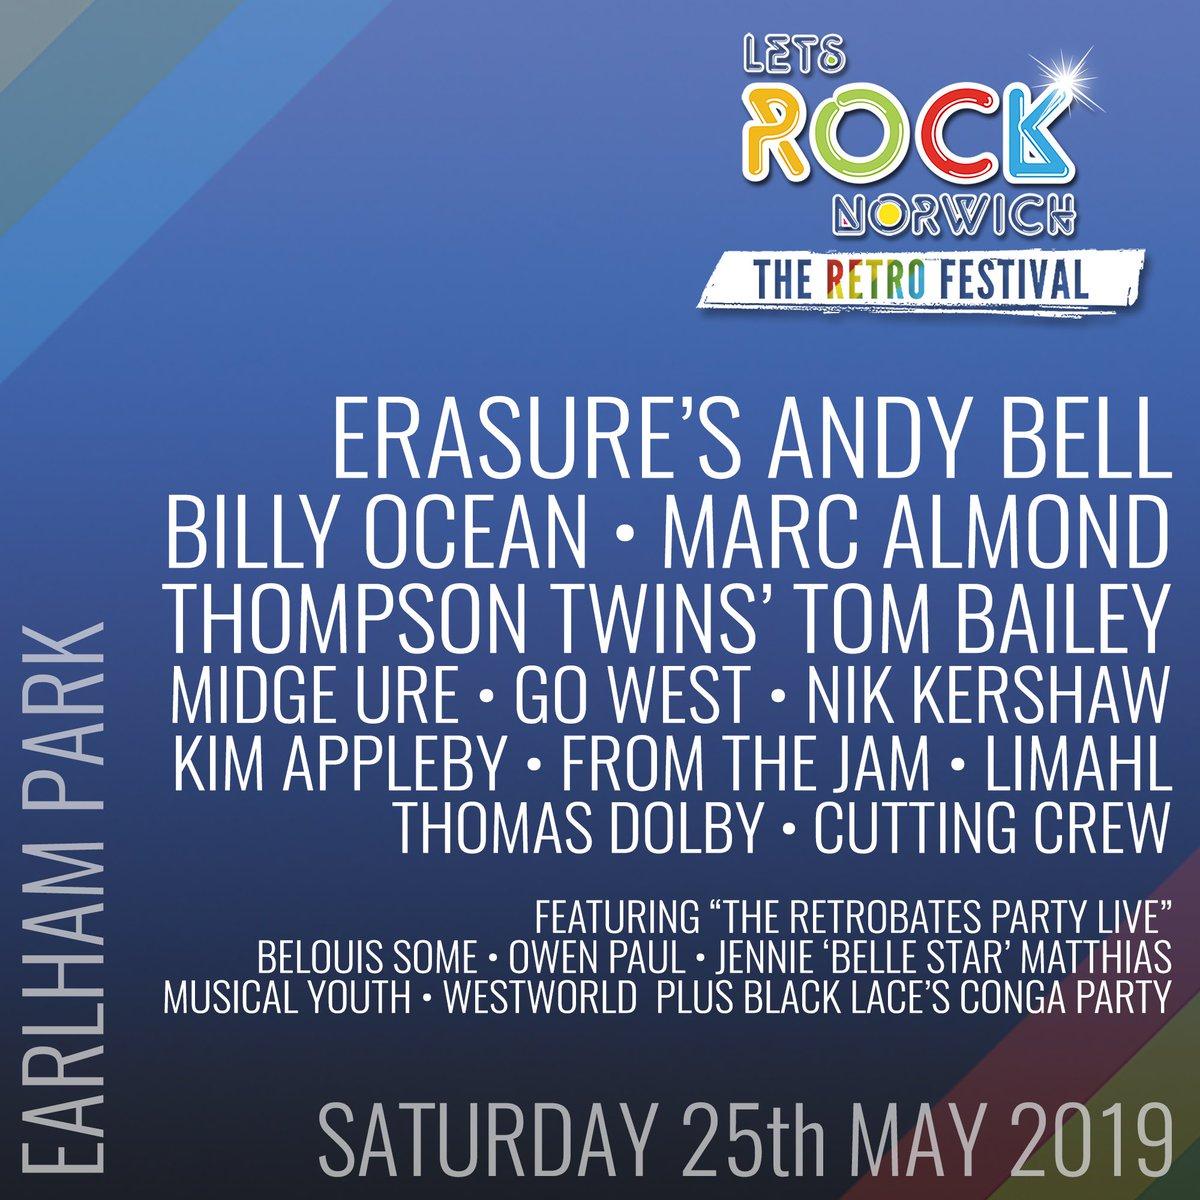 Lets rock the 80s - Norwich